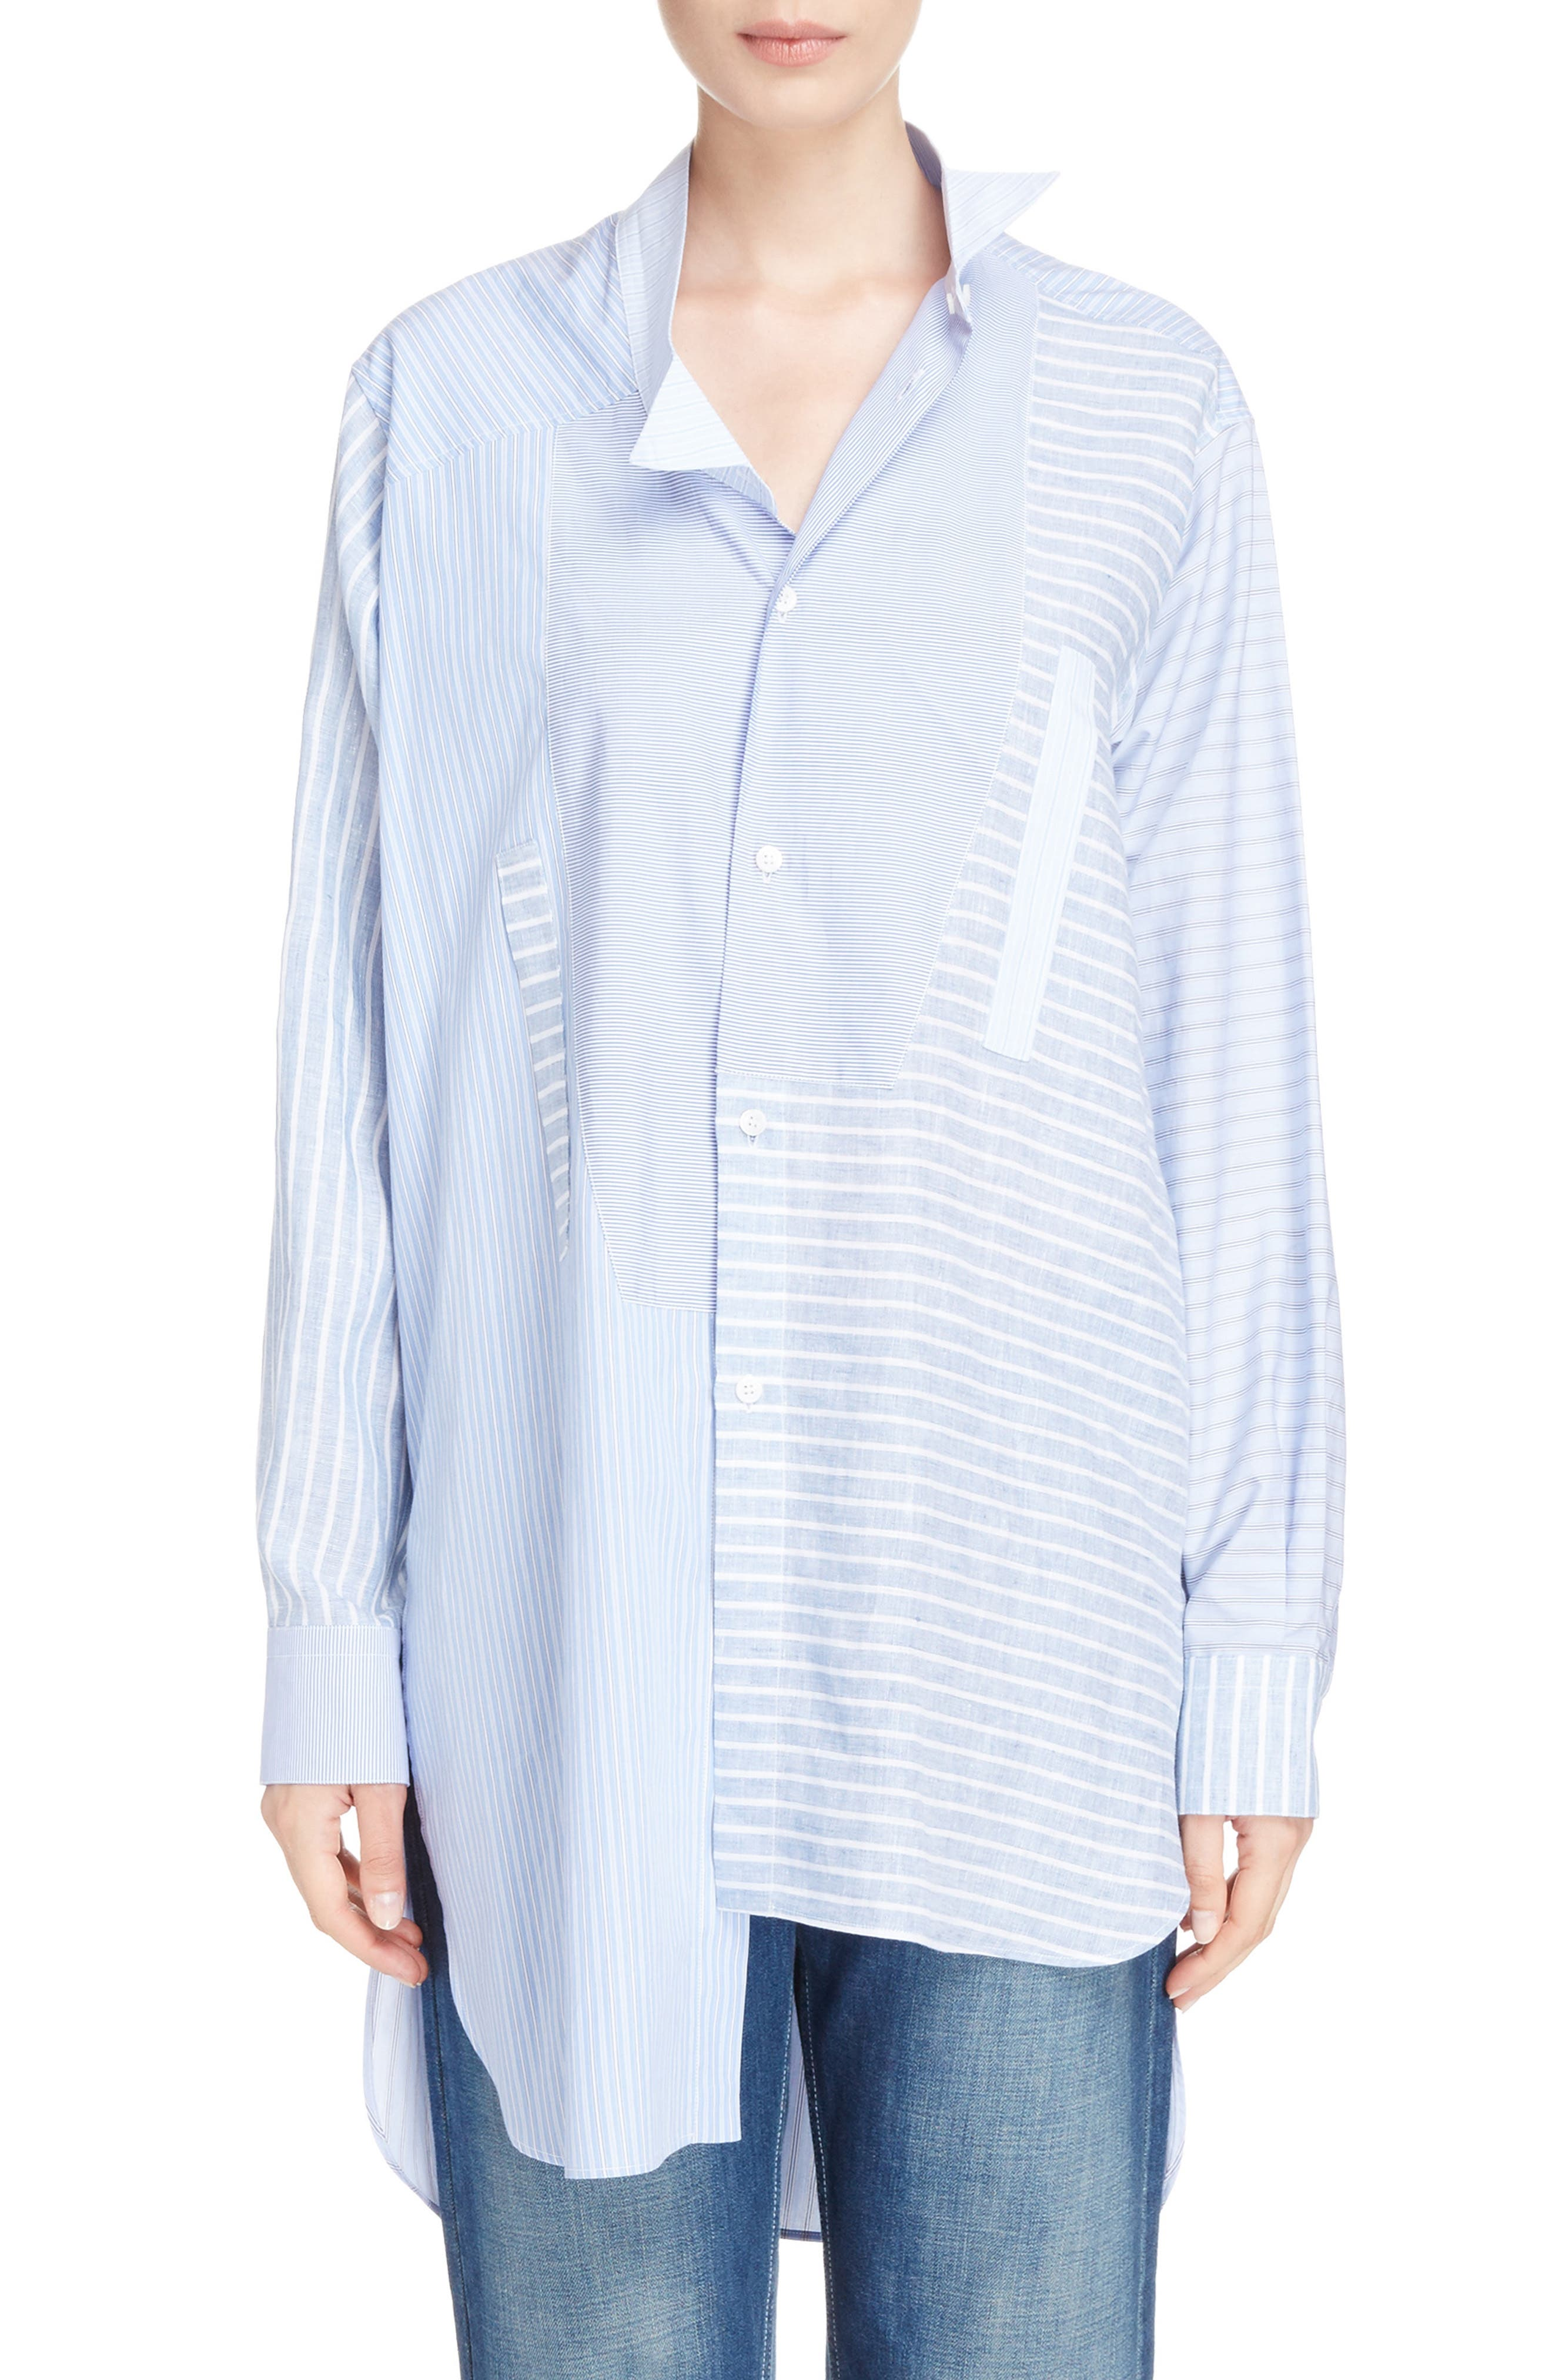 Loewe Patchwork Cotton & Linen Shirt